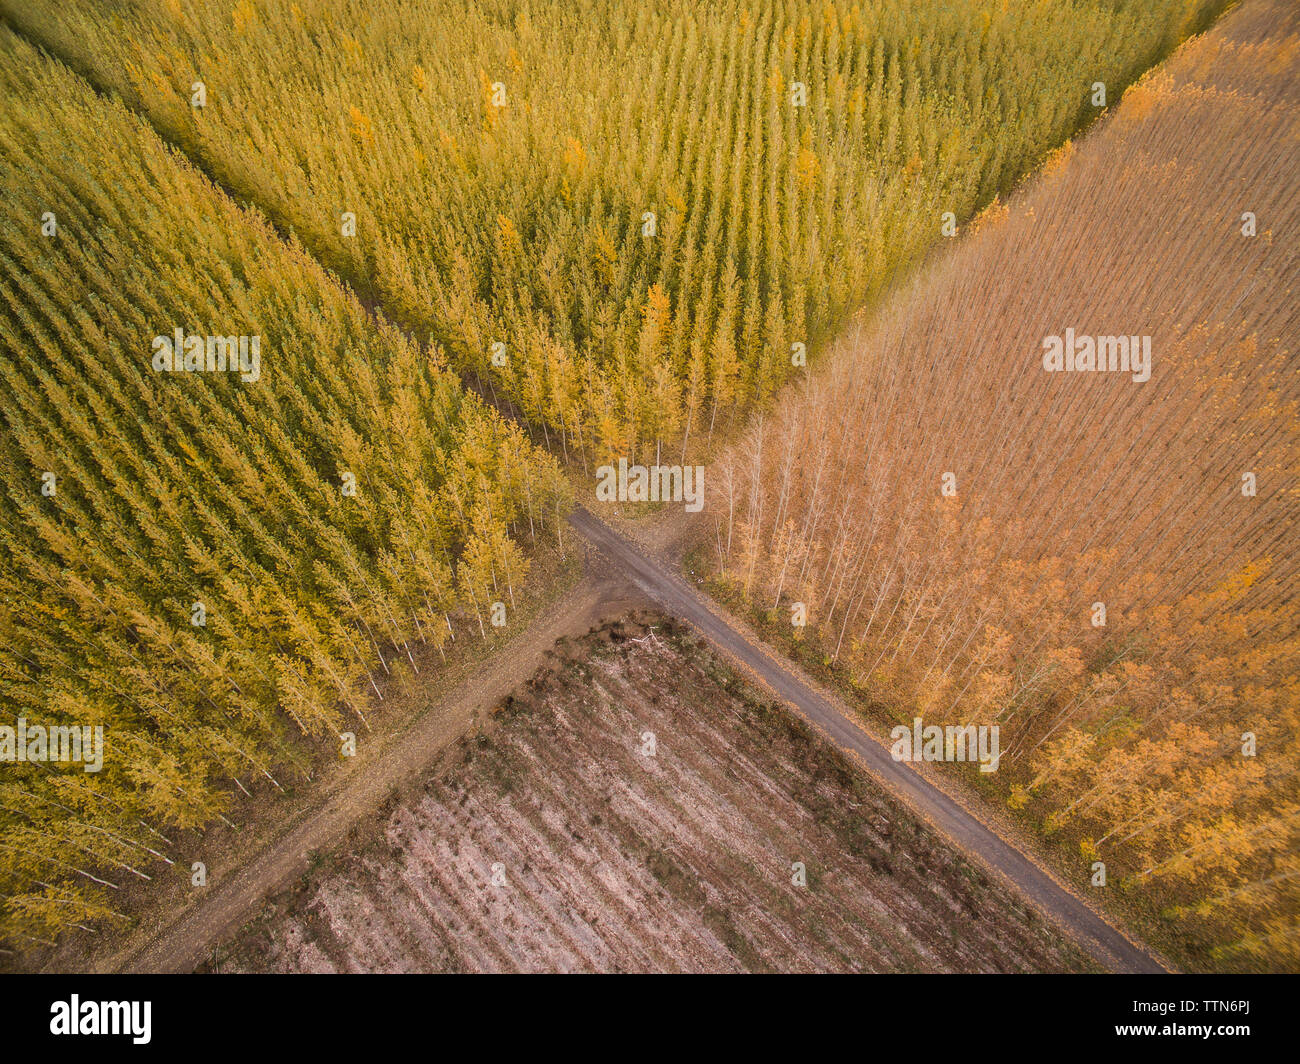 High angle view of tree farms Photo Stock